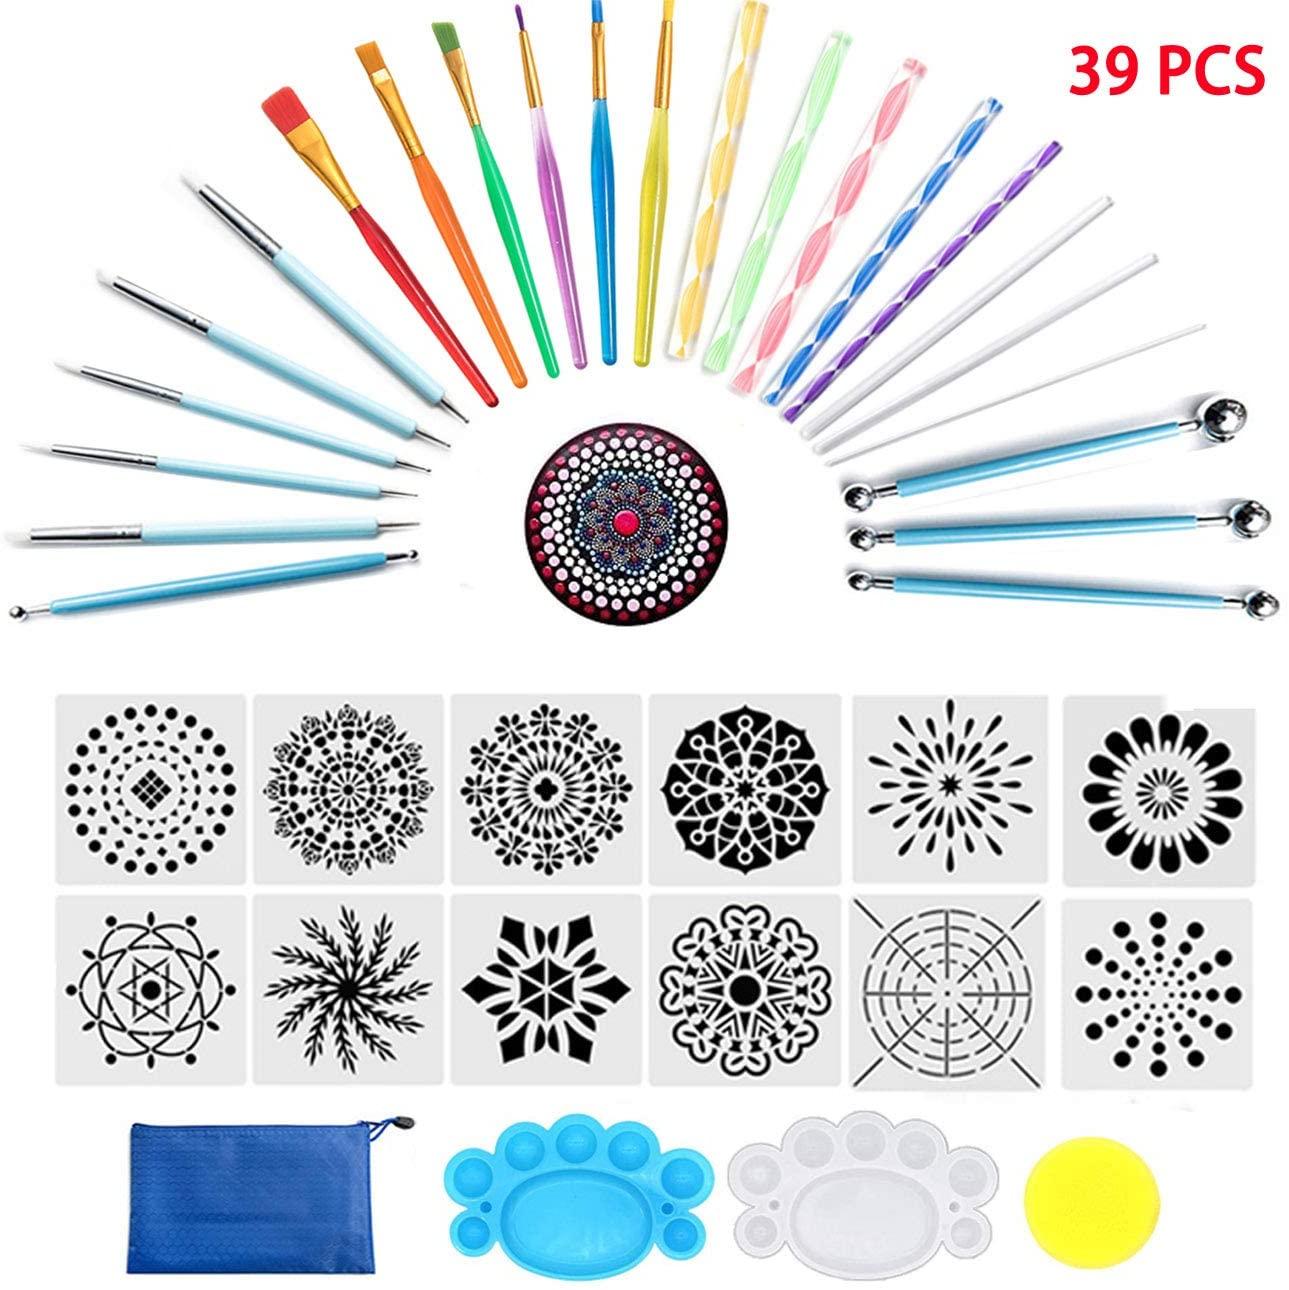 Mandala Dotting Tools, 39 PCS Dotting Tools Set with a Blue Zipper Waterproof Storage Bag, Dot Painting Tool for Rock Painting, Nail Dotting and Art Drawing